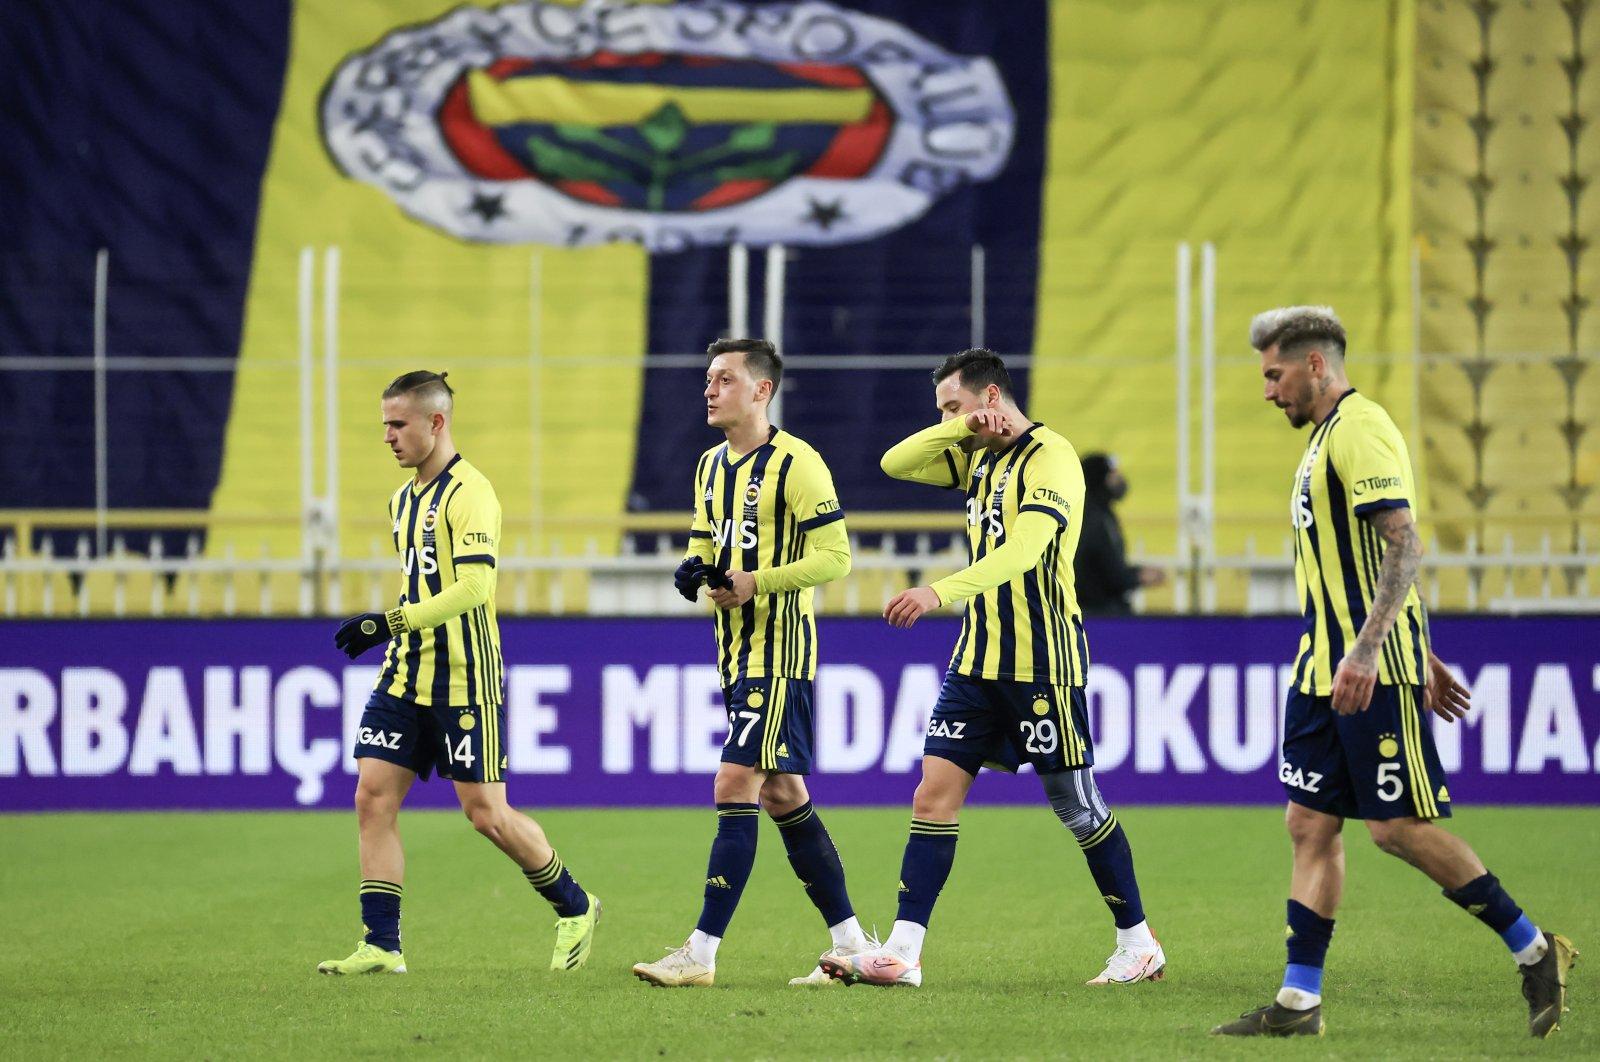 Fenerbahçe players Jose Ernesto Sosa (2nd R), Sinan Gümüş (R), Mesut Özil (C) and Dimitris Pelkas (L) walk off the pitch after losing their match to Göztepe, Istanbul, Turkey, Feb. 21, 2021. (AA Photo)